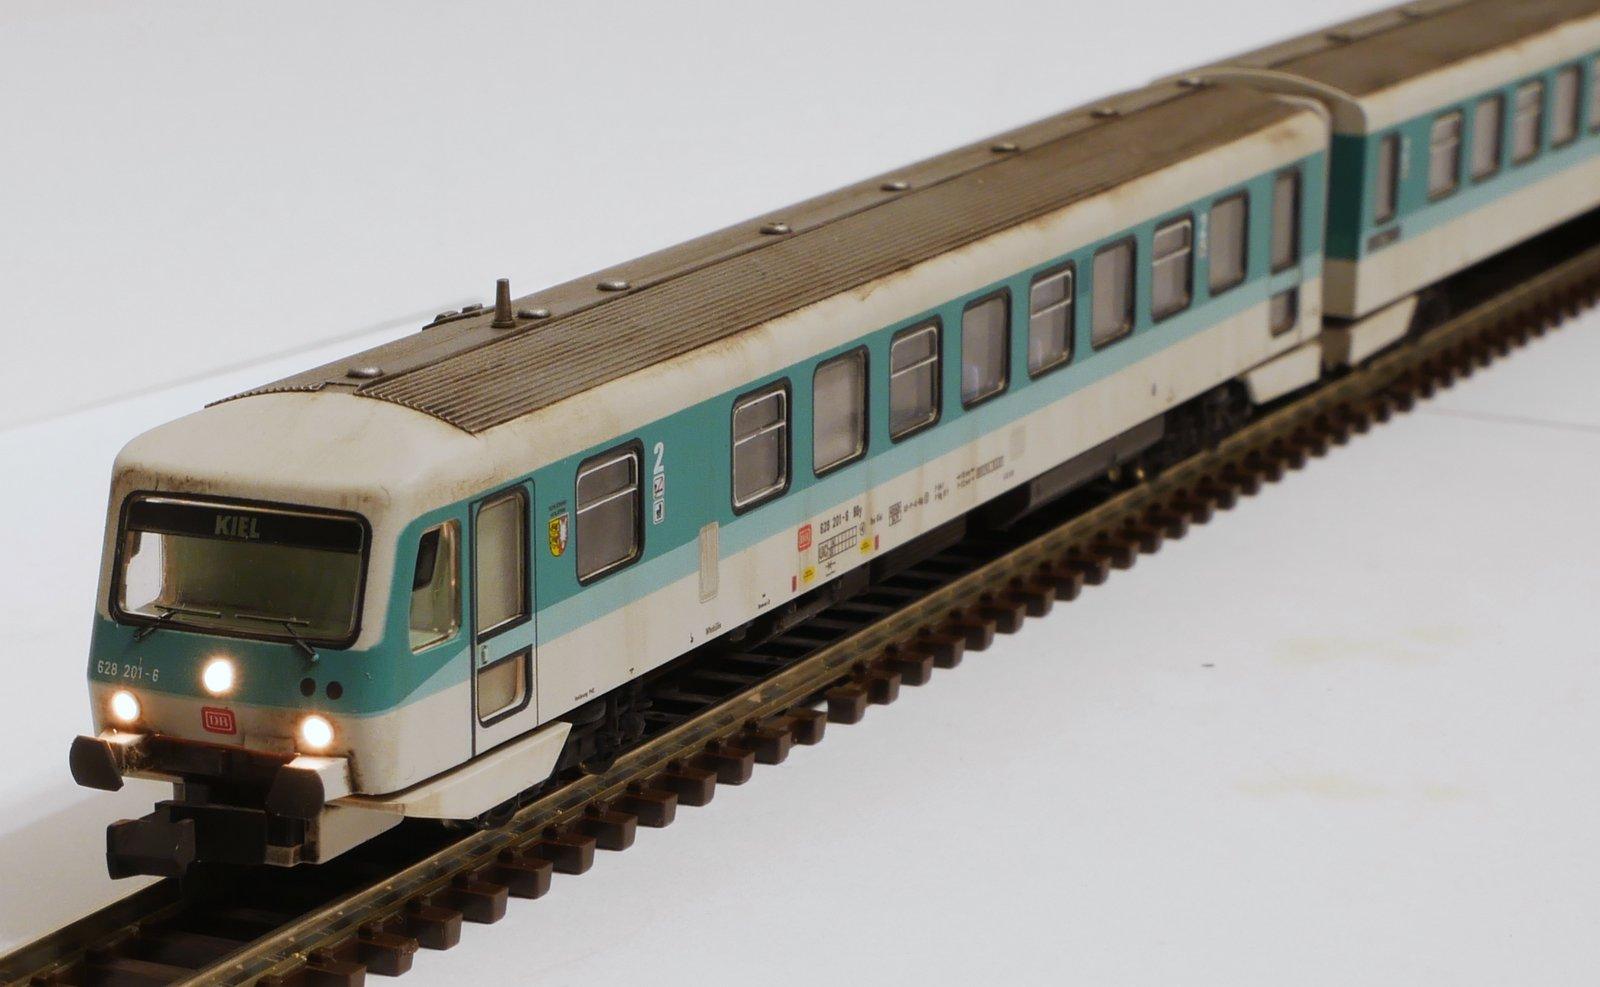 P1140779-001.JPG